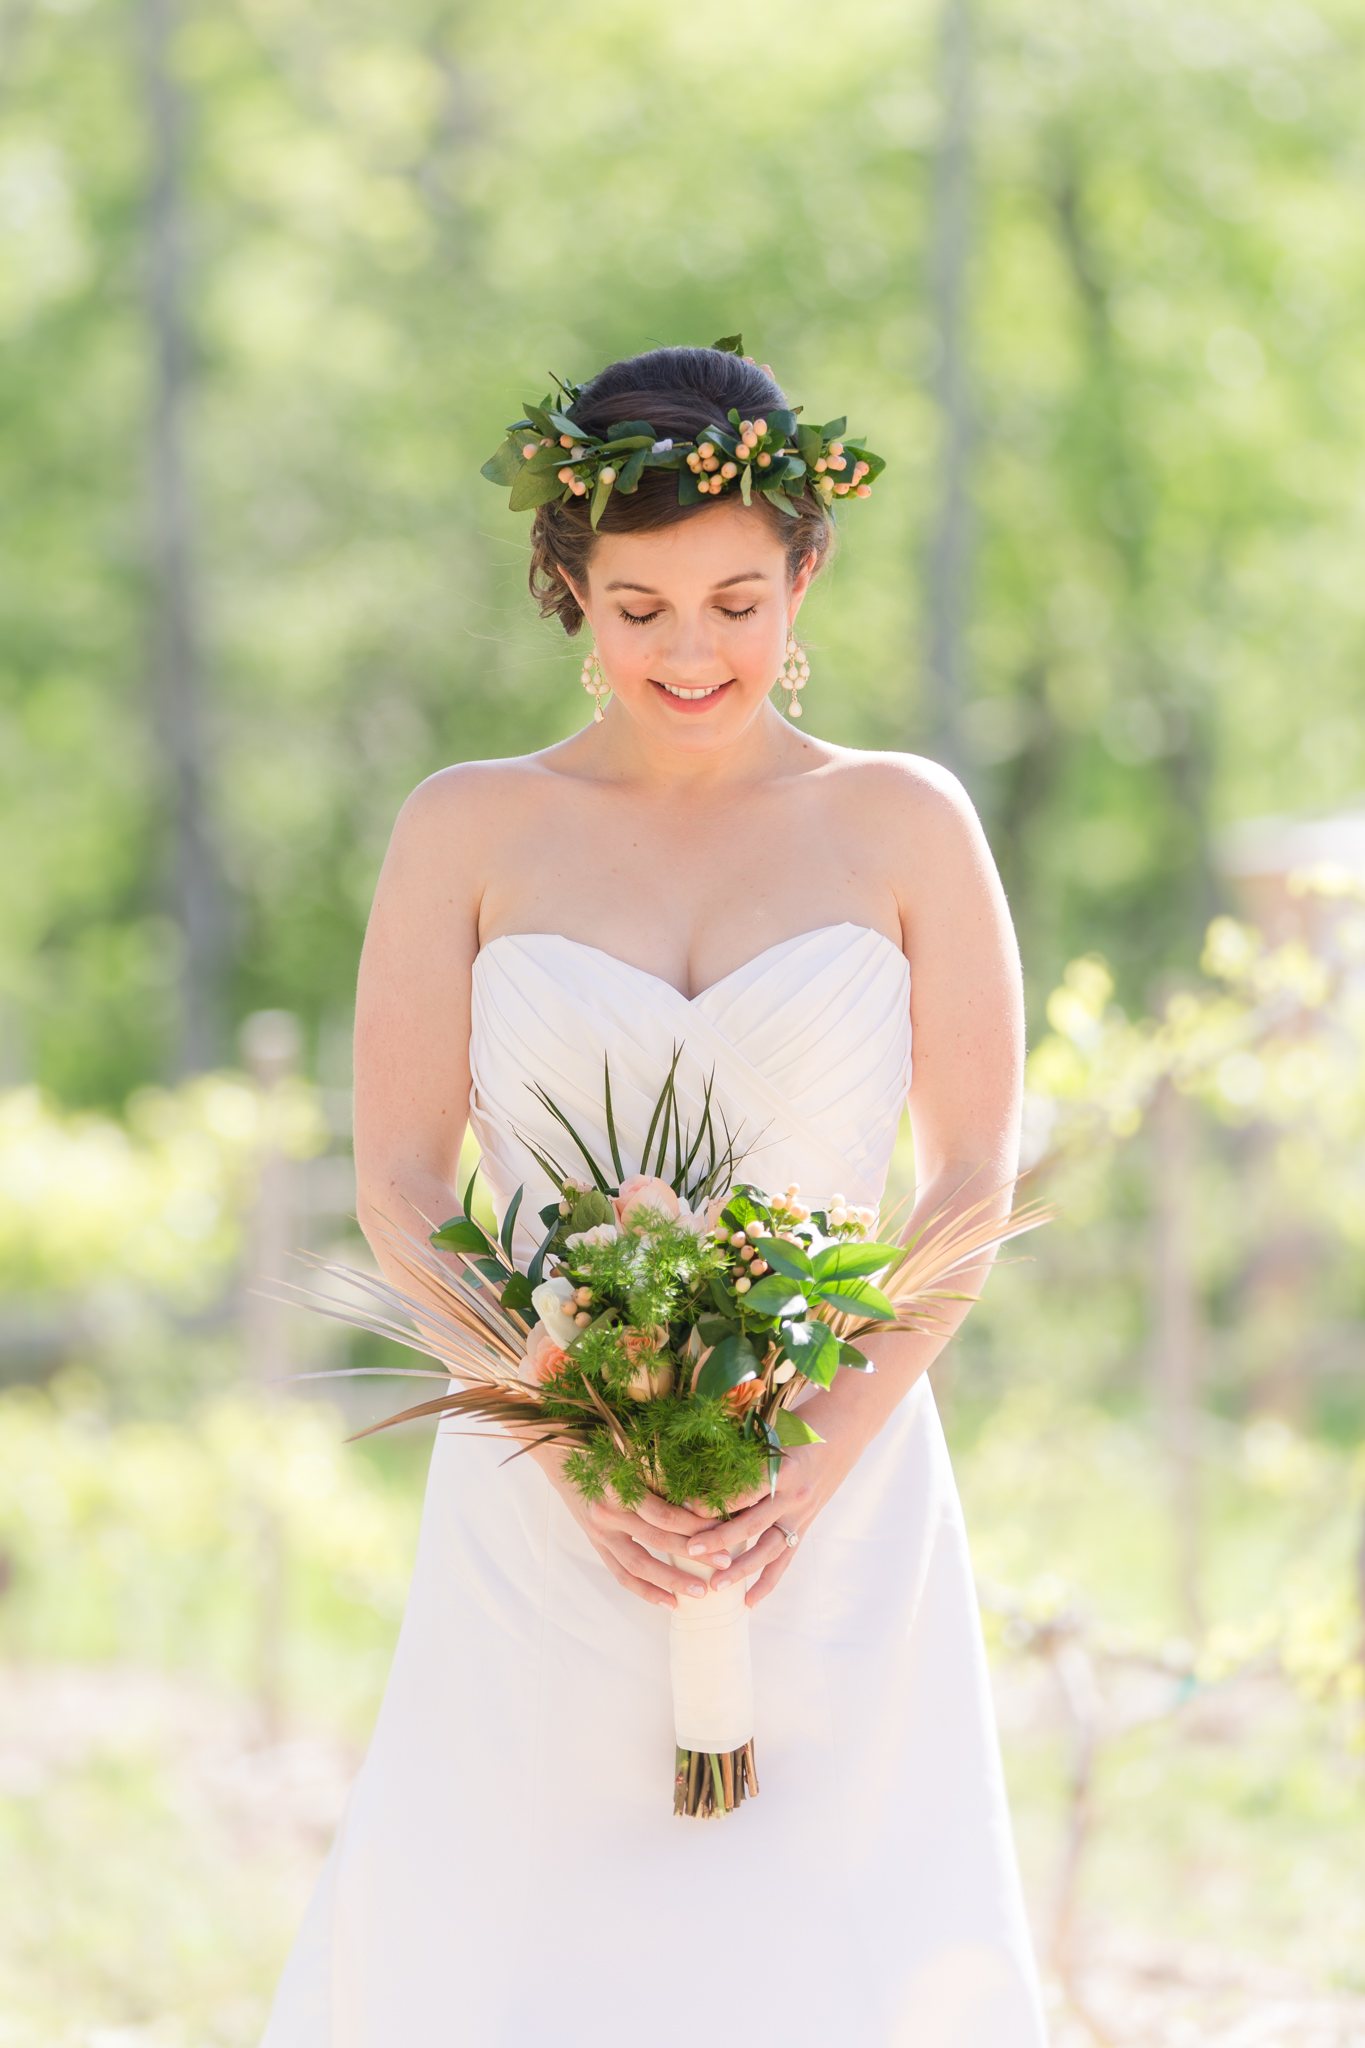 Ashley-Amber-Photo-Outdoor-Wedding-Photography-164714.jpg